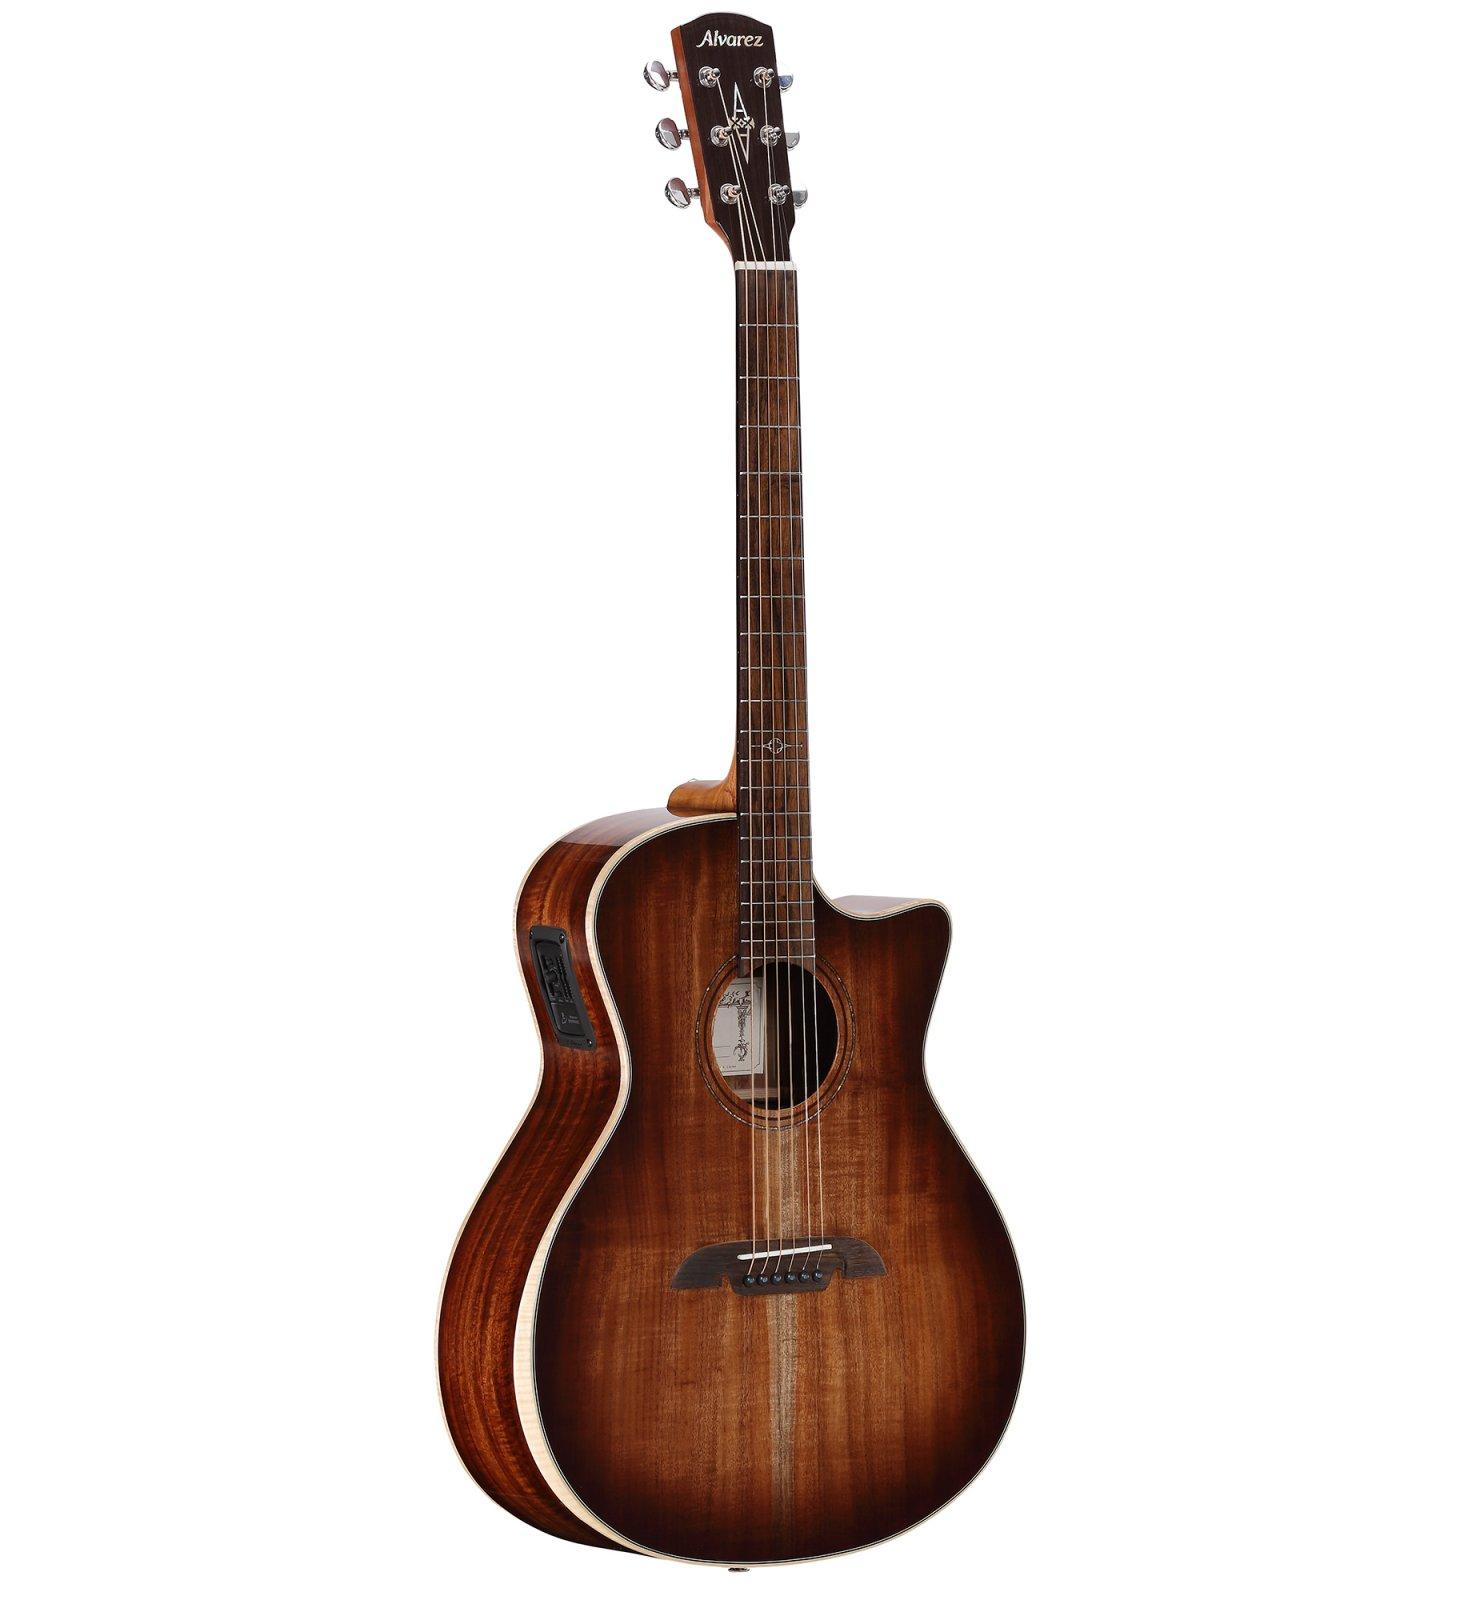 Alvarez AGA99CEARSHB Artist Elite Acoustic Electric Guitar